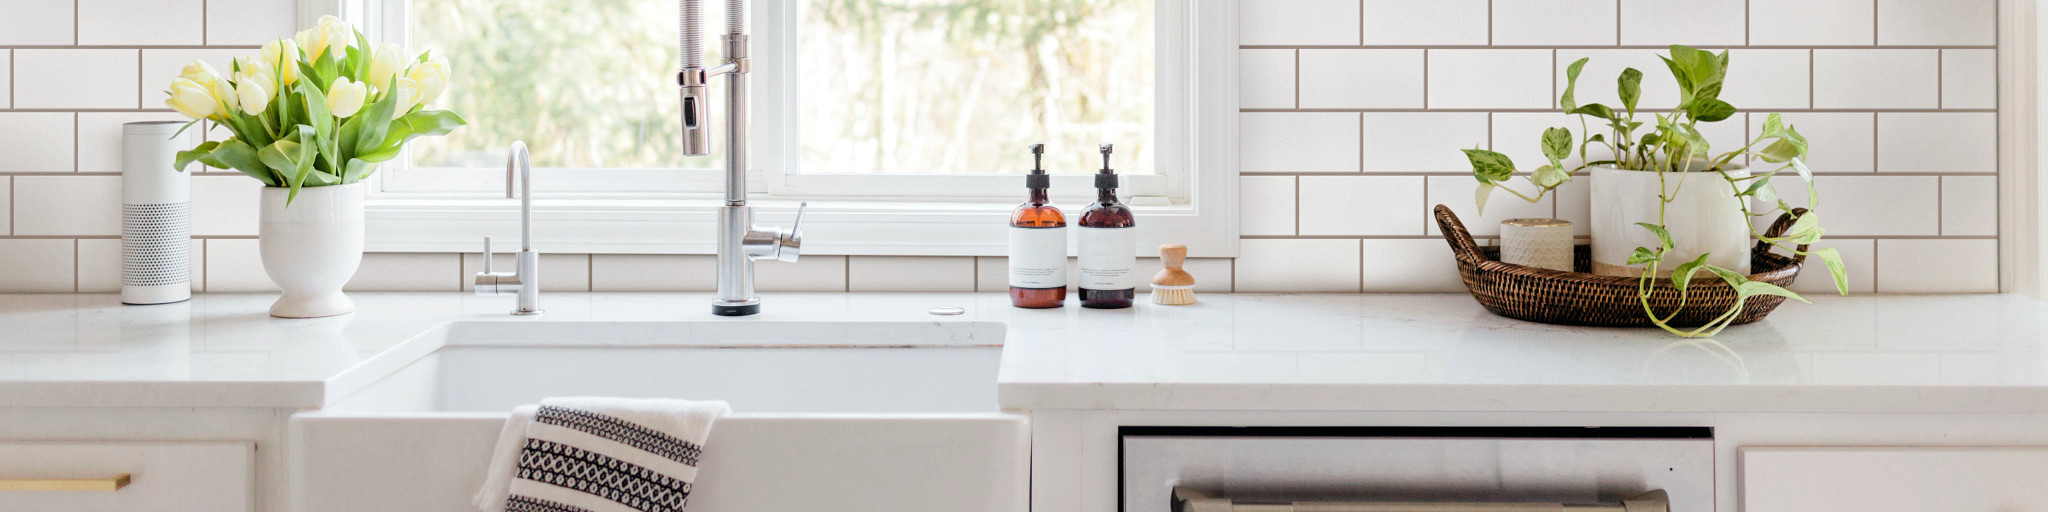 Tile-and-Stone-Elegance-Cs34l-100-Kitchen-Countertop-2021